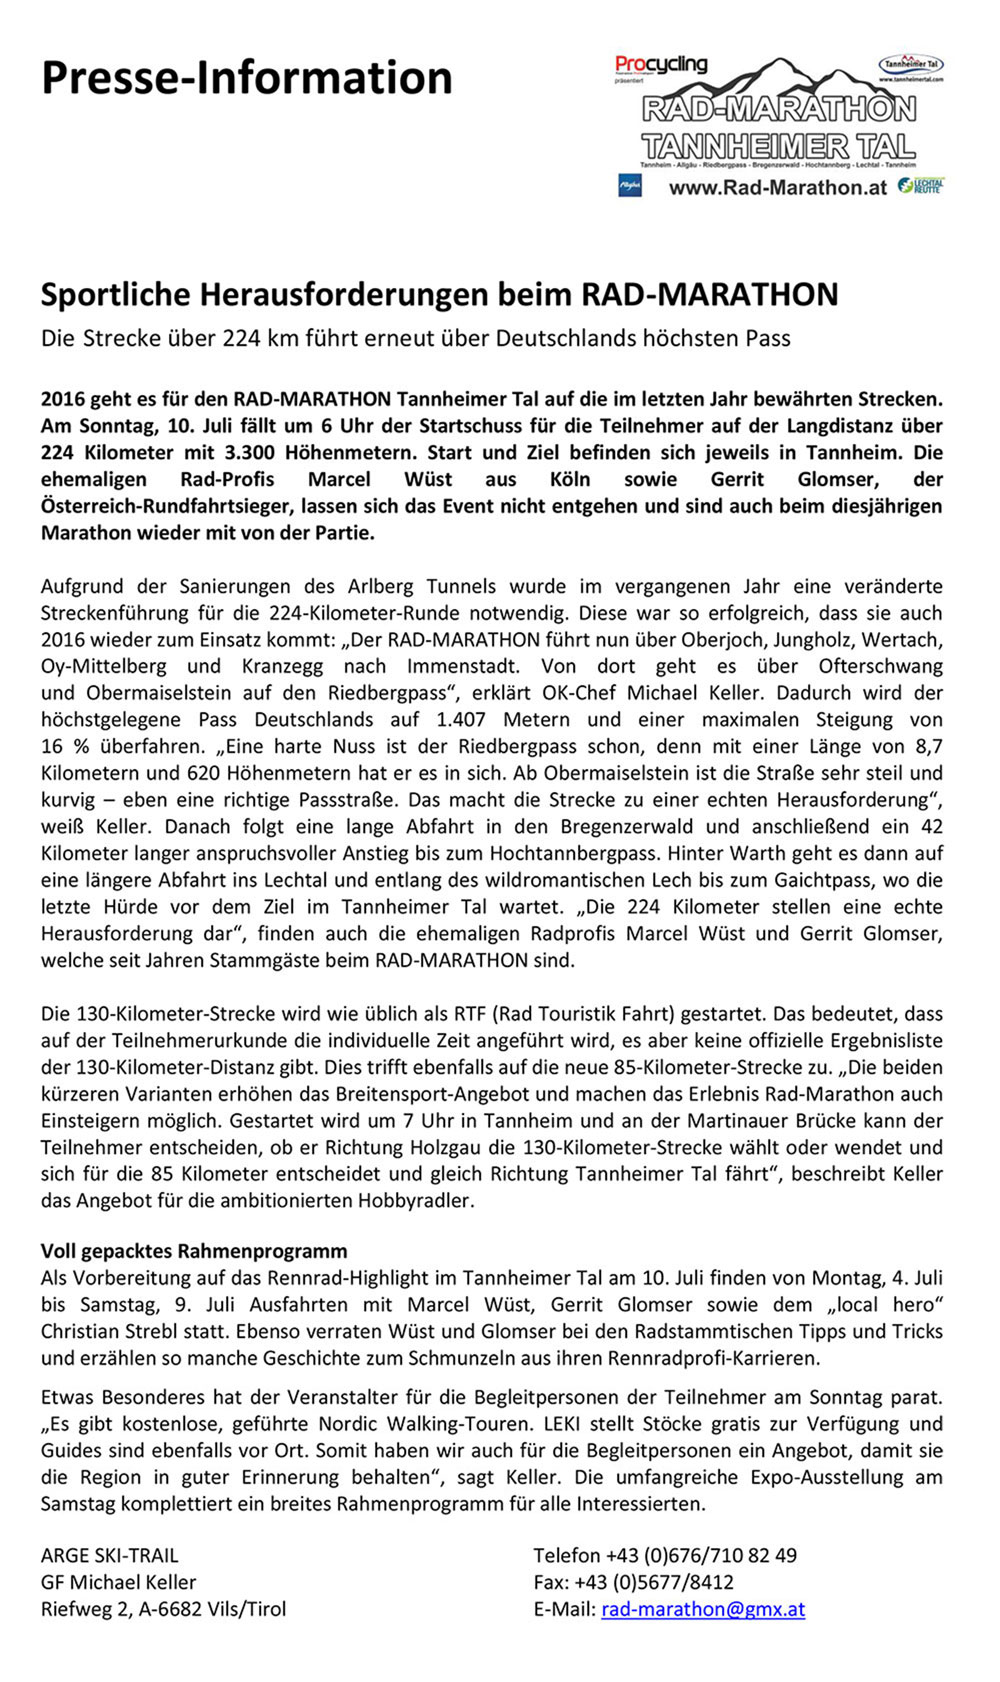 Pressemeldung Rad-Marathon Tannheimer Tal 2016